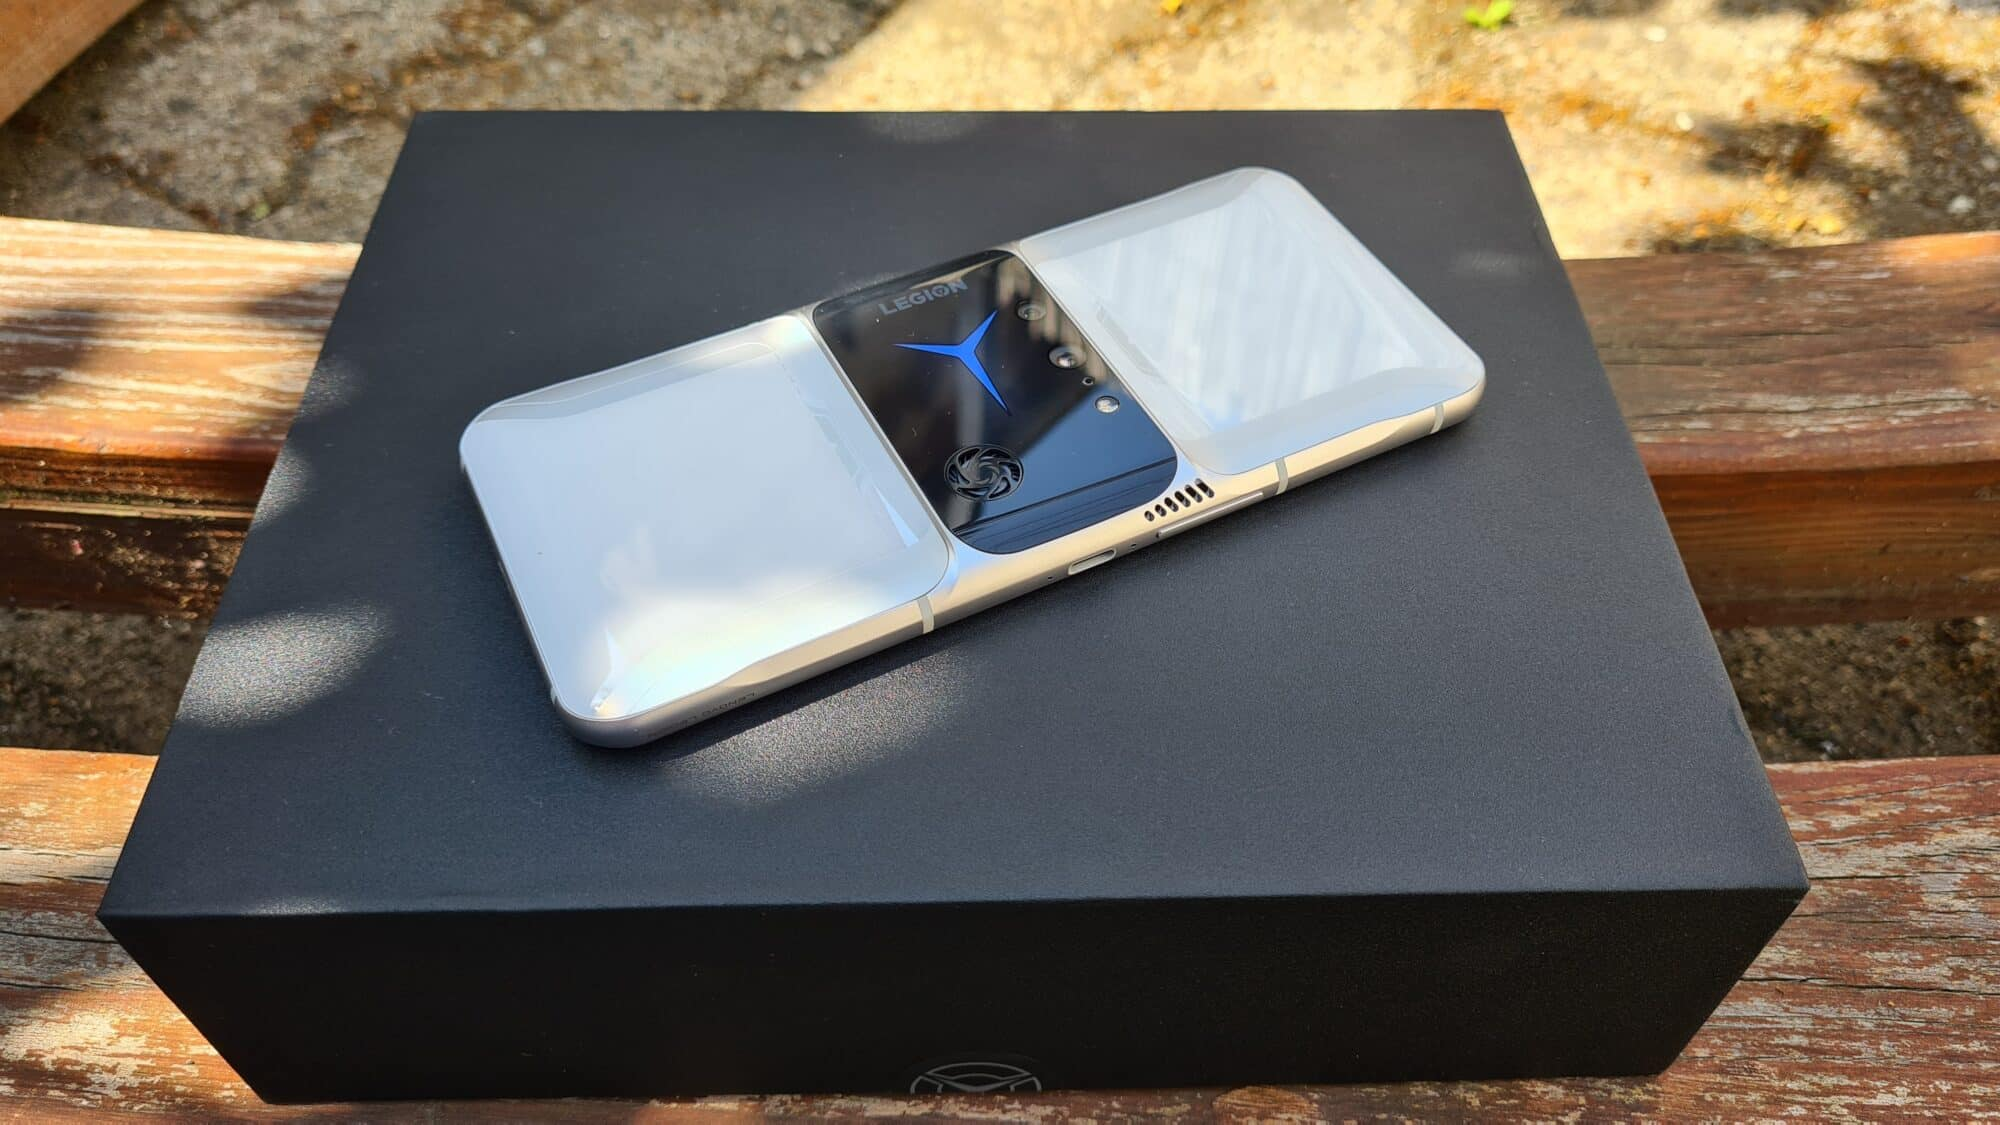 Legion Phone Duel 2 Smartphone Lenovo smartphone gaming